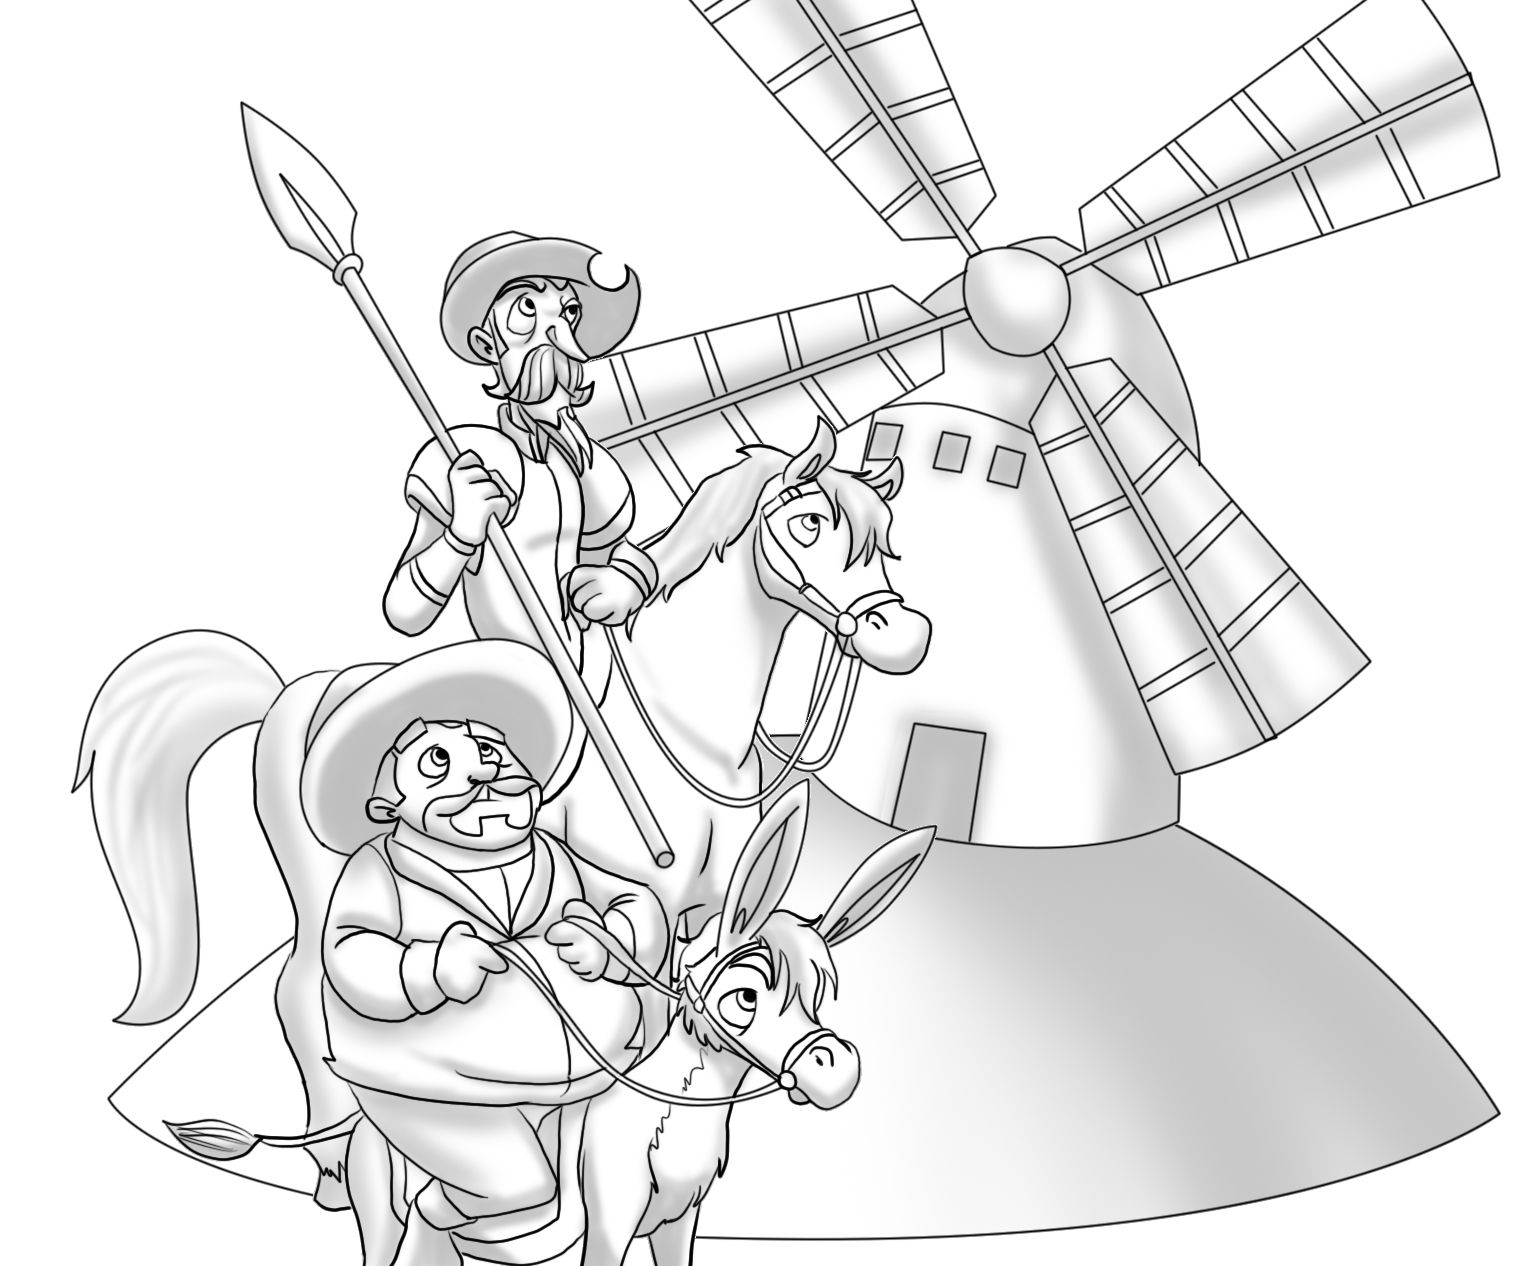 24d6e6e8e2dbf618207d5660dc89c78f Jpg 1514 1266 Don Quijote Dibujo Don Quijote Quijote Dibujo